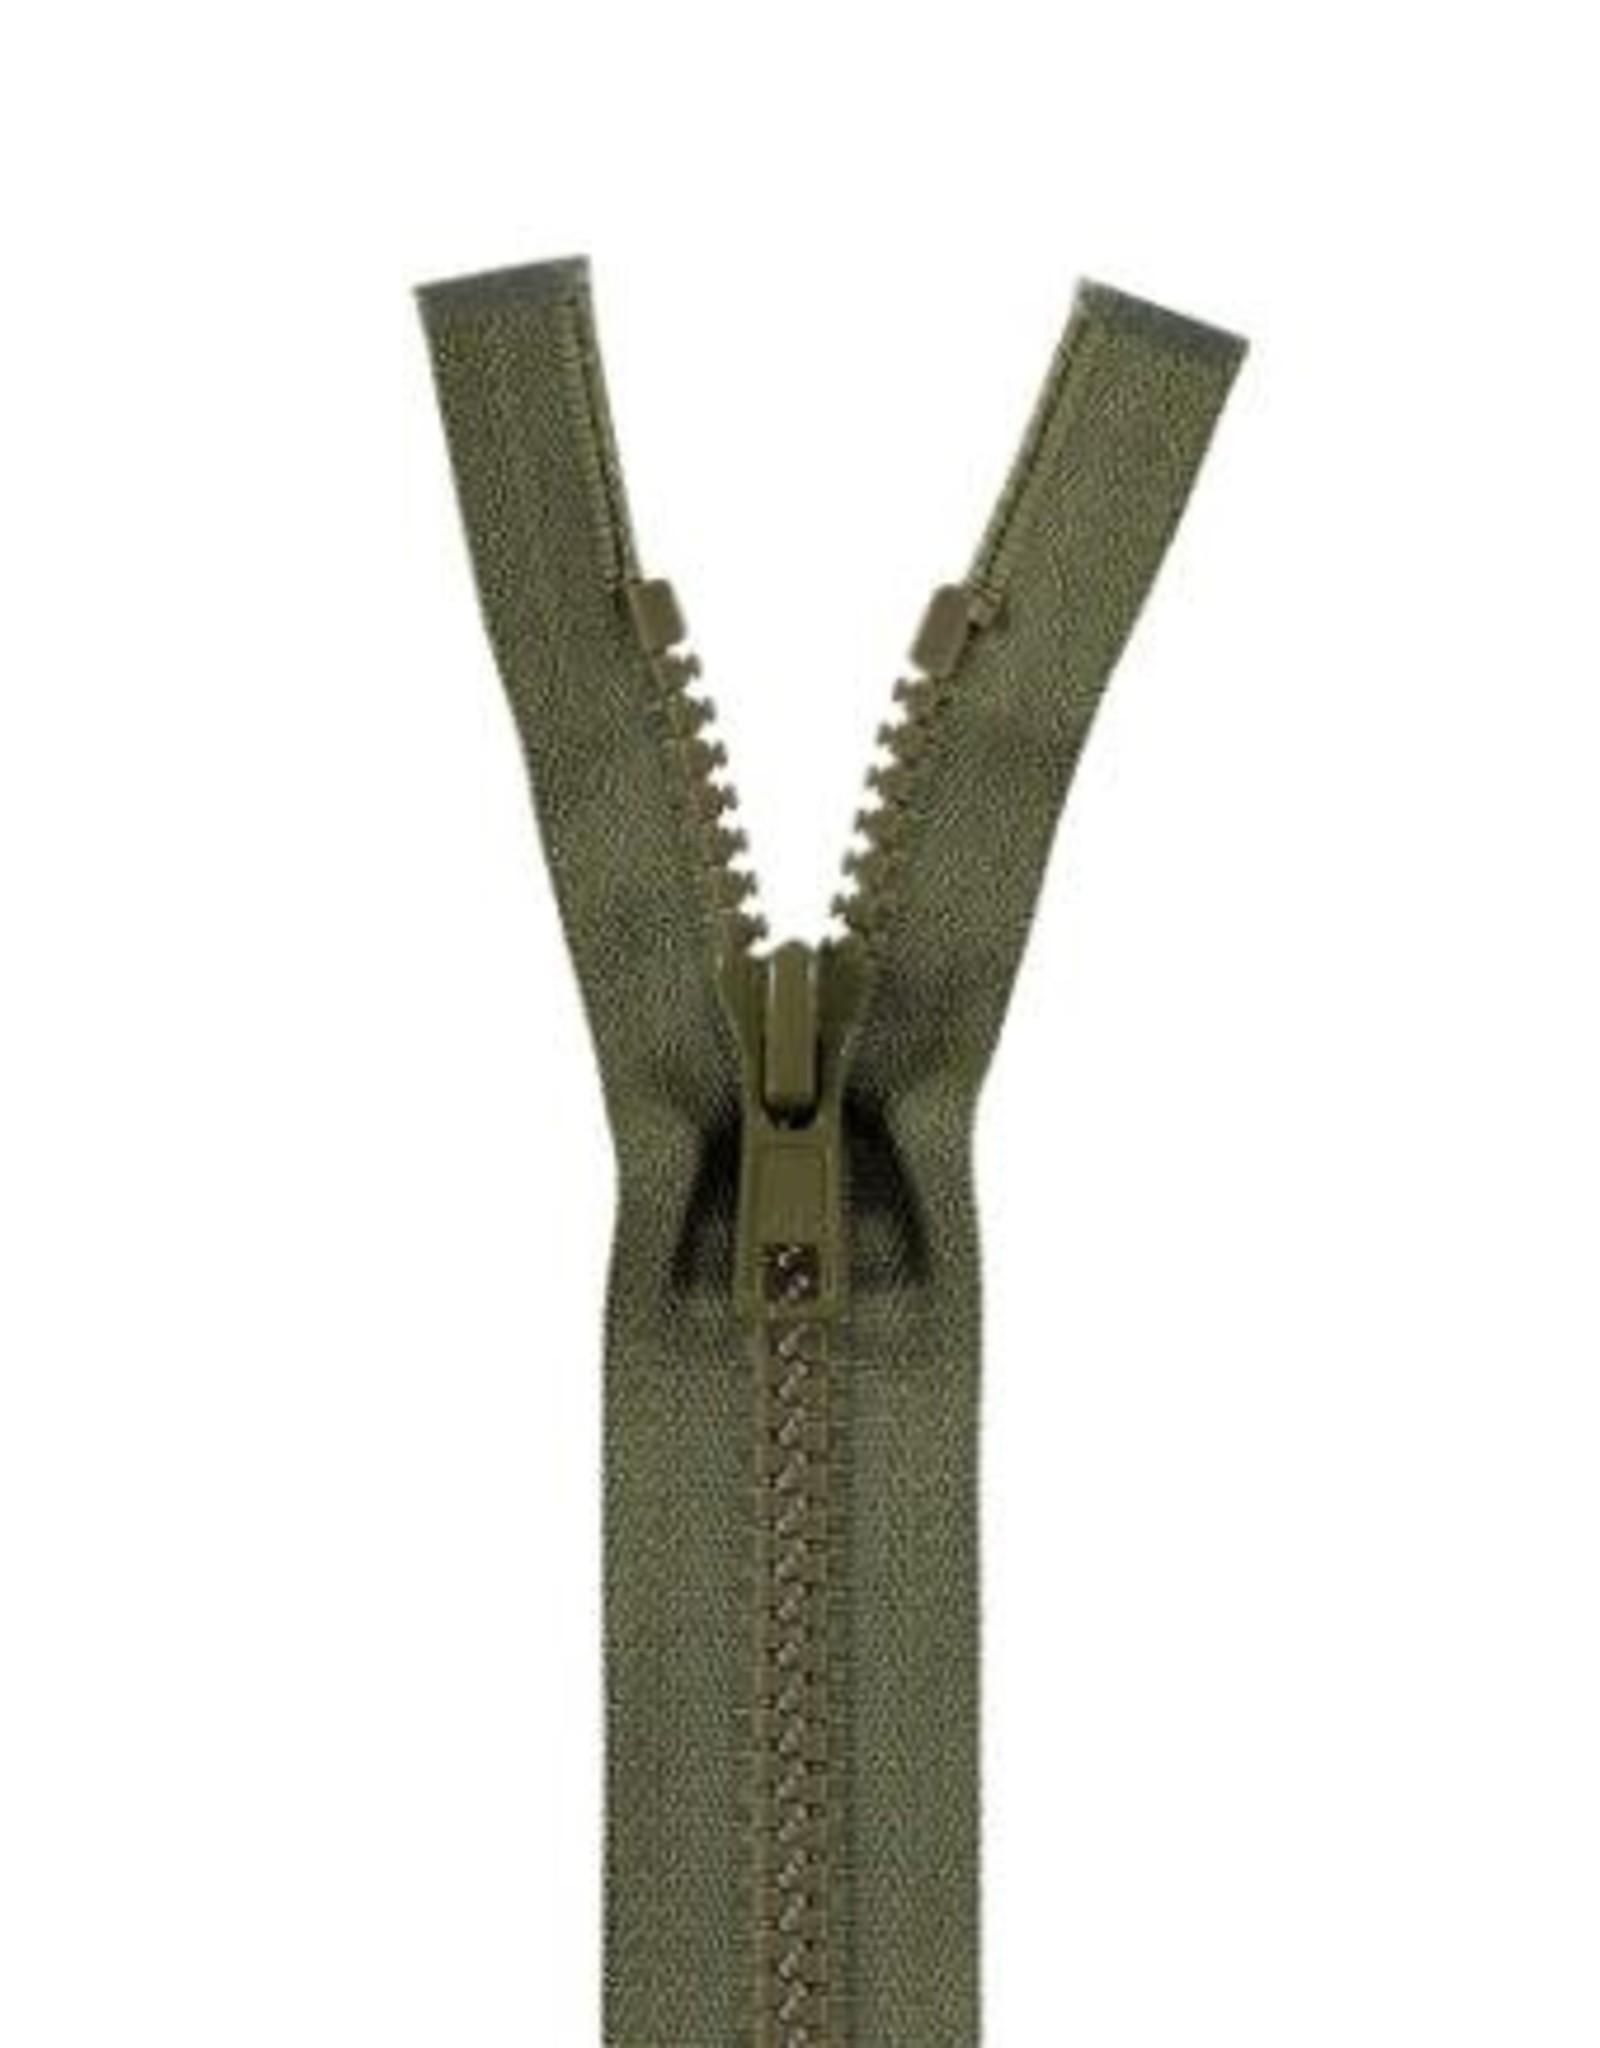 YKK BLOKRITS 5 DEELBAAR legergroen 566-30cm